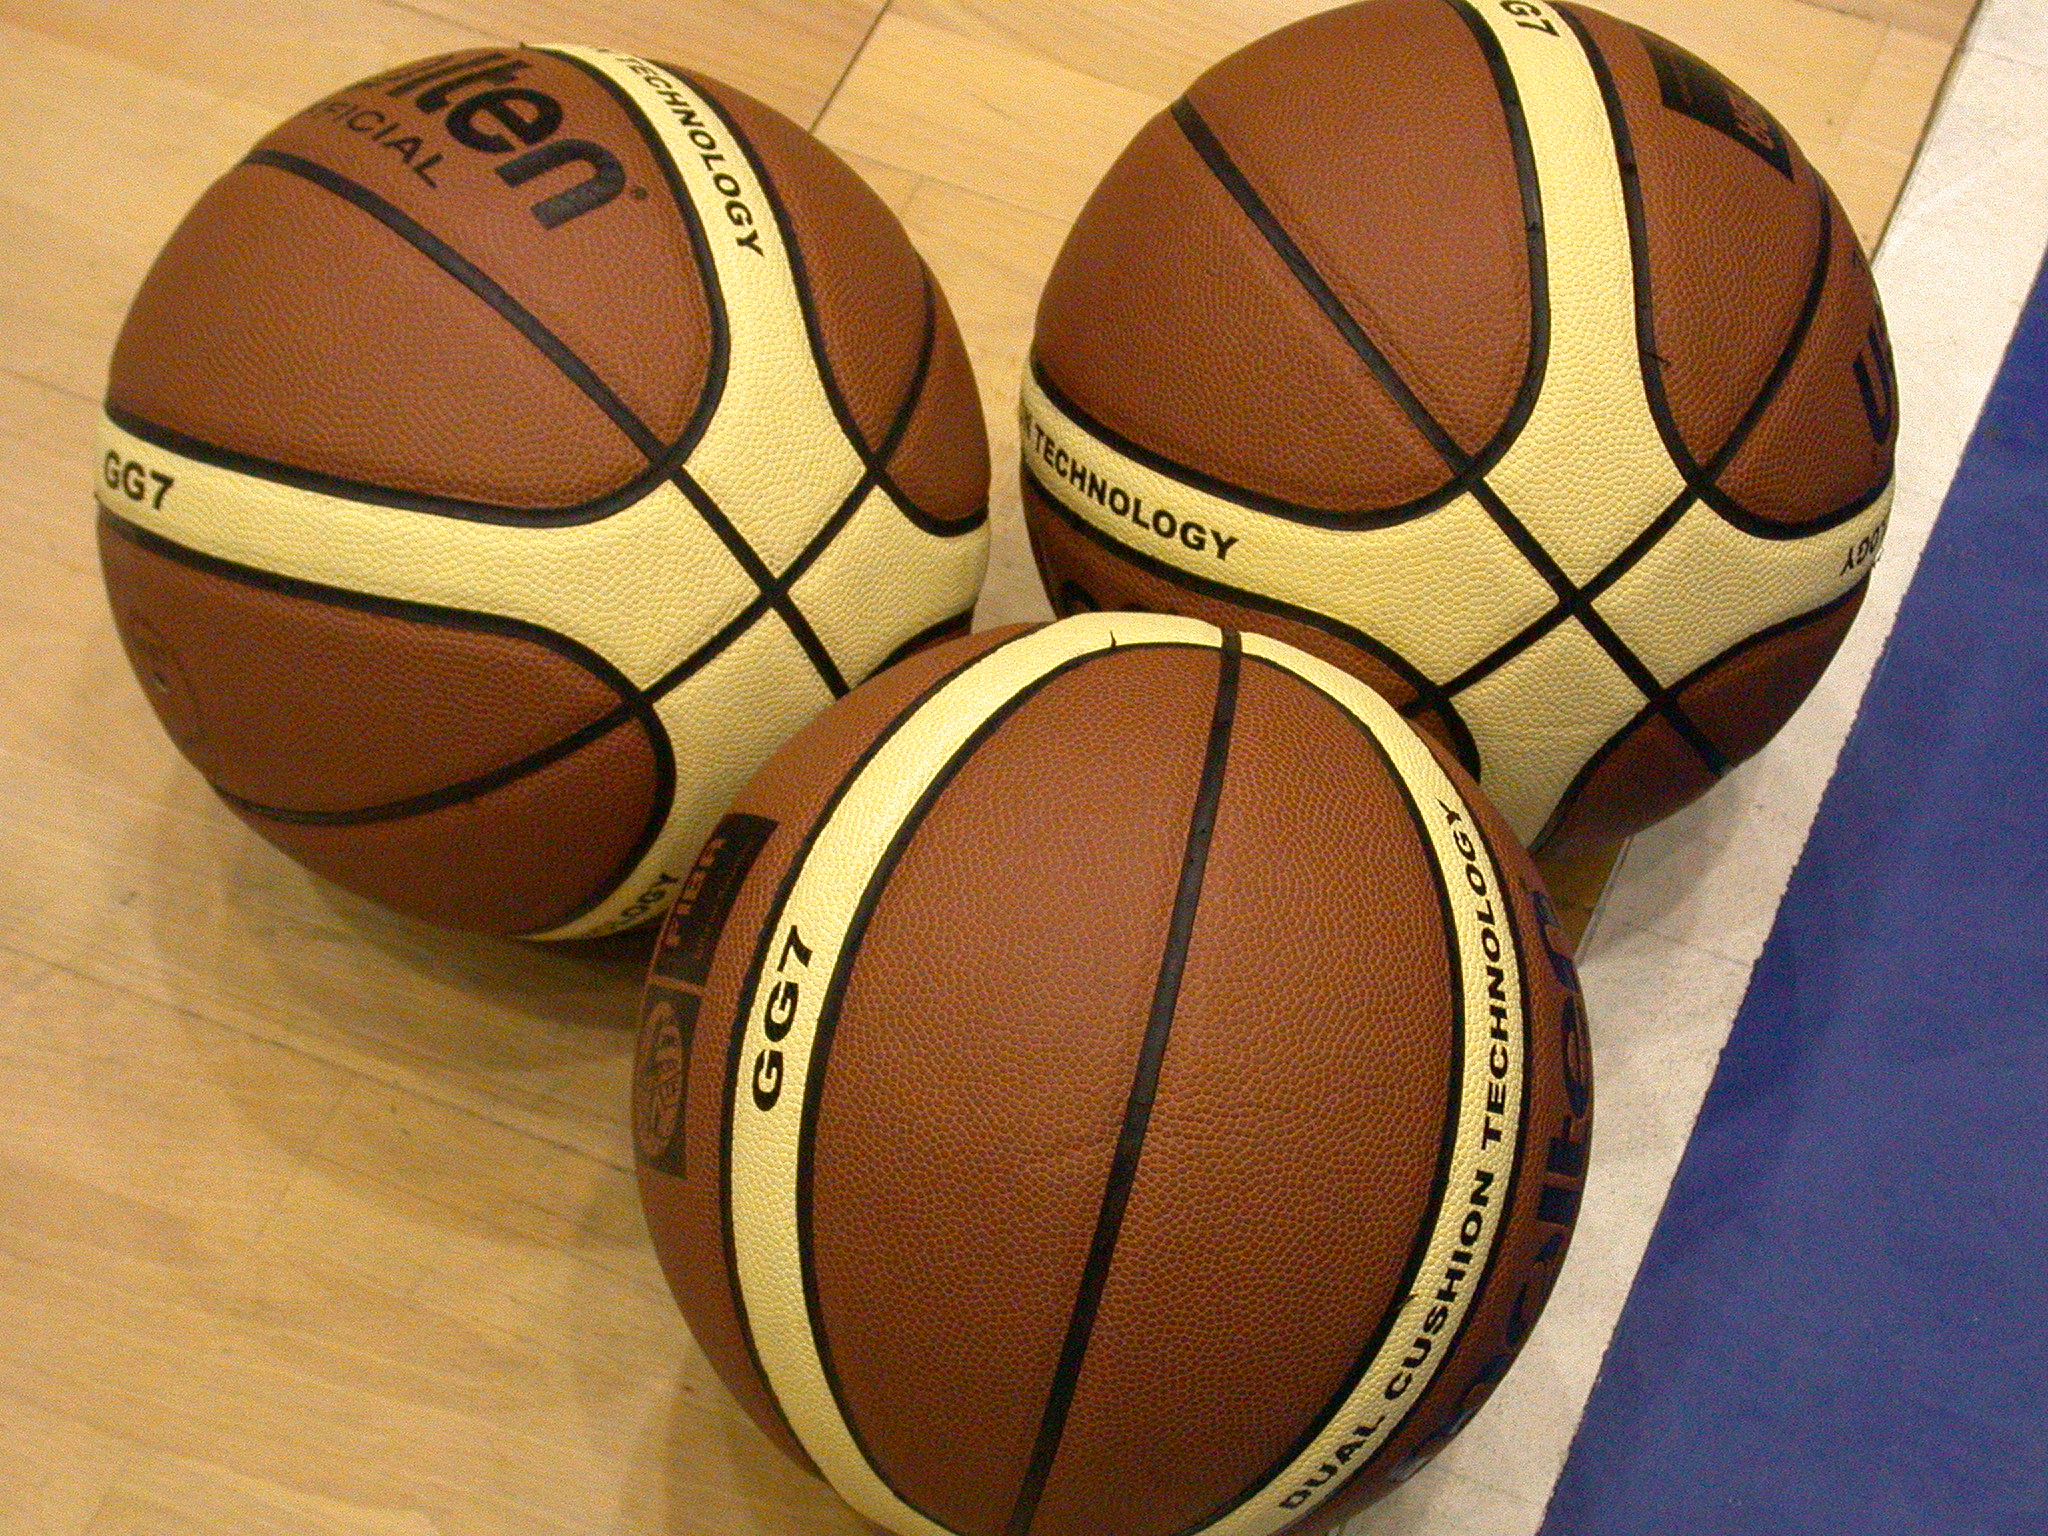 FIBA_Basketballs_2004-2005.JPG (2048×1536)